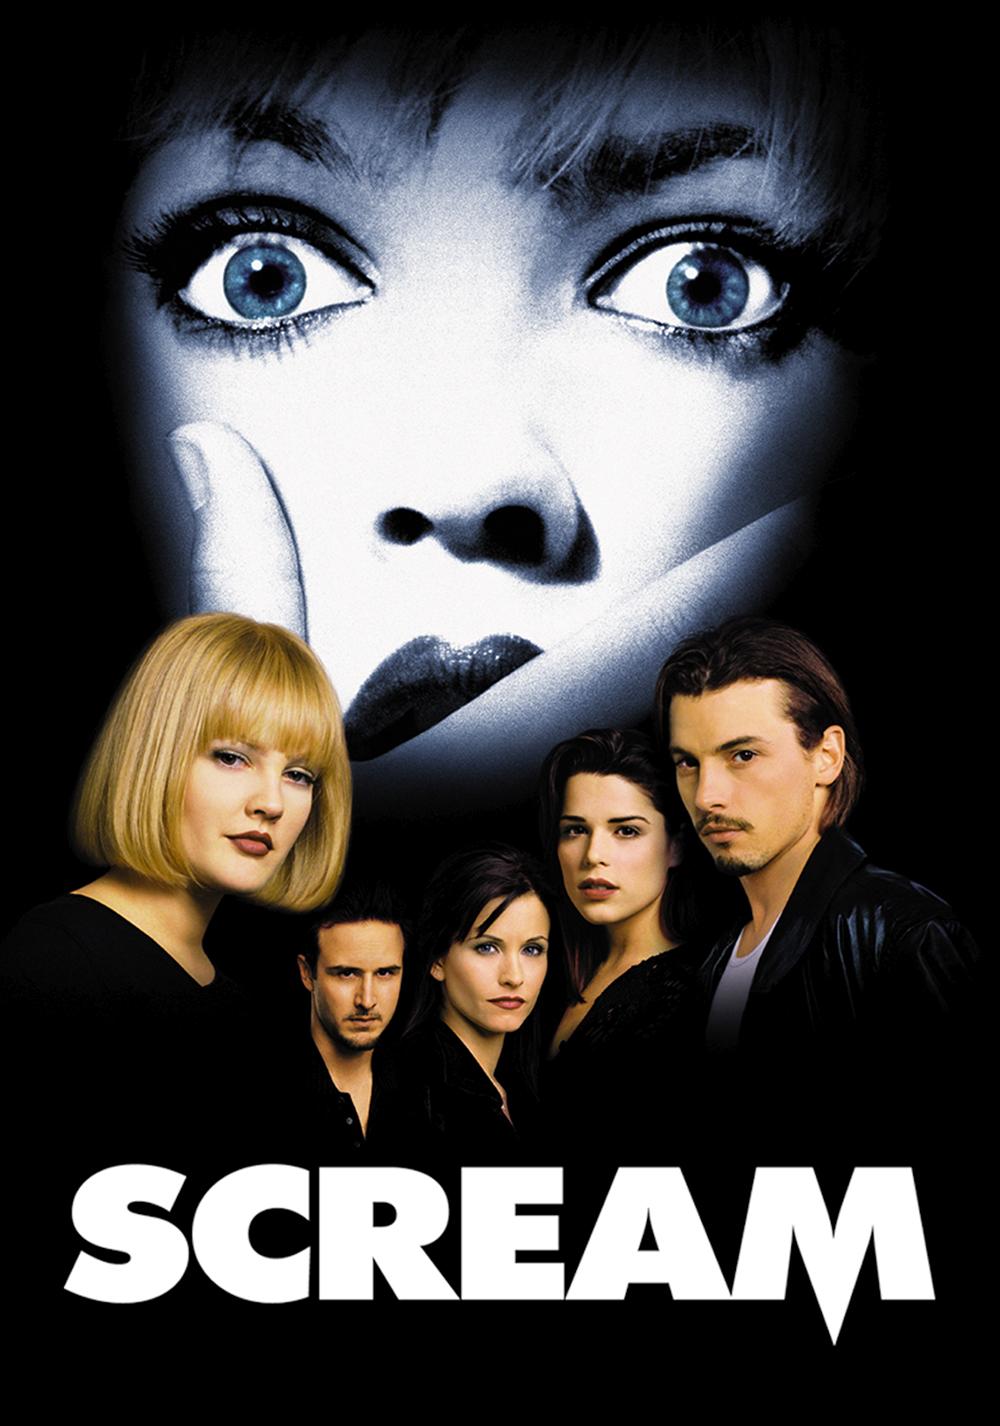 Scream Movie Poster Art